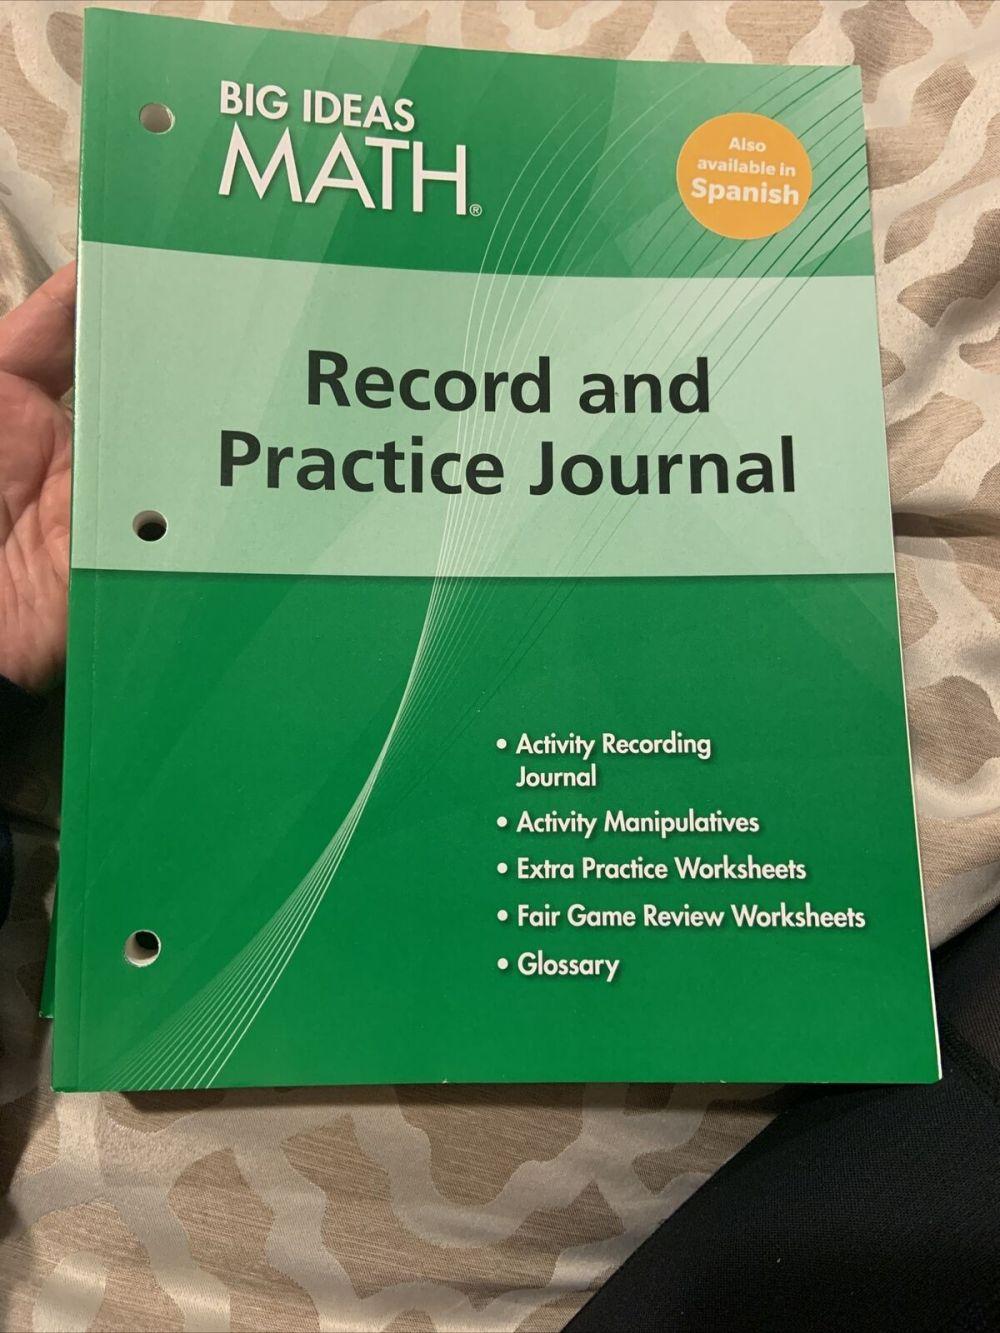 medium resolution of Big Ideas Math Record \u0026 Practice Journal Grade 6 Green Common Core  9781608404605 for sale online   eBay